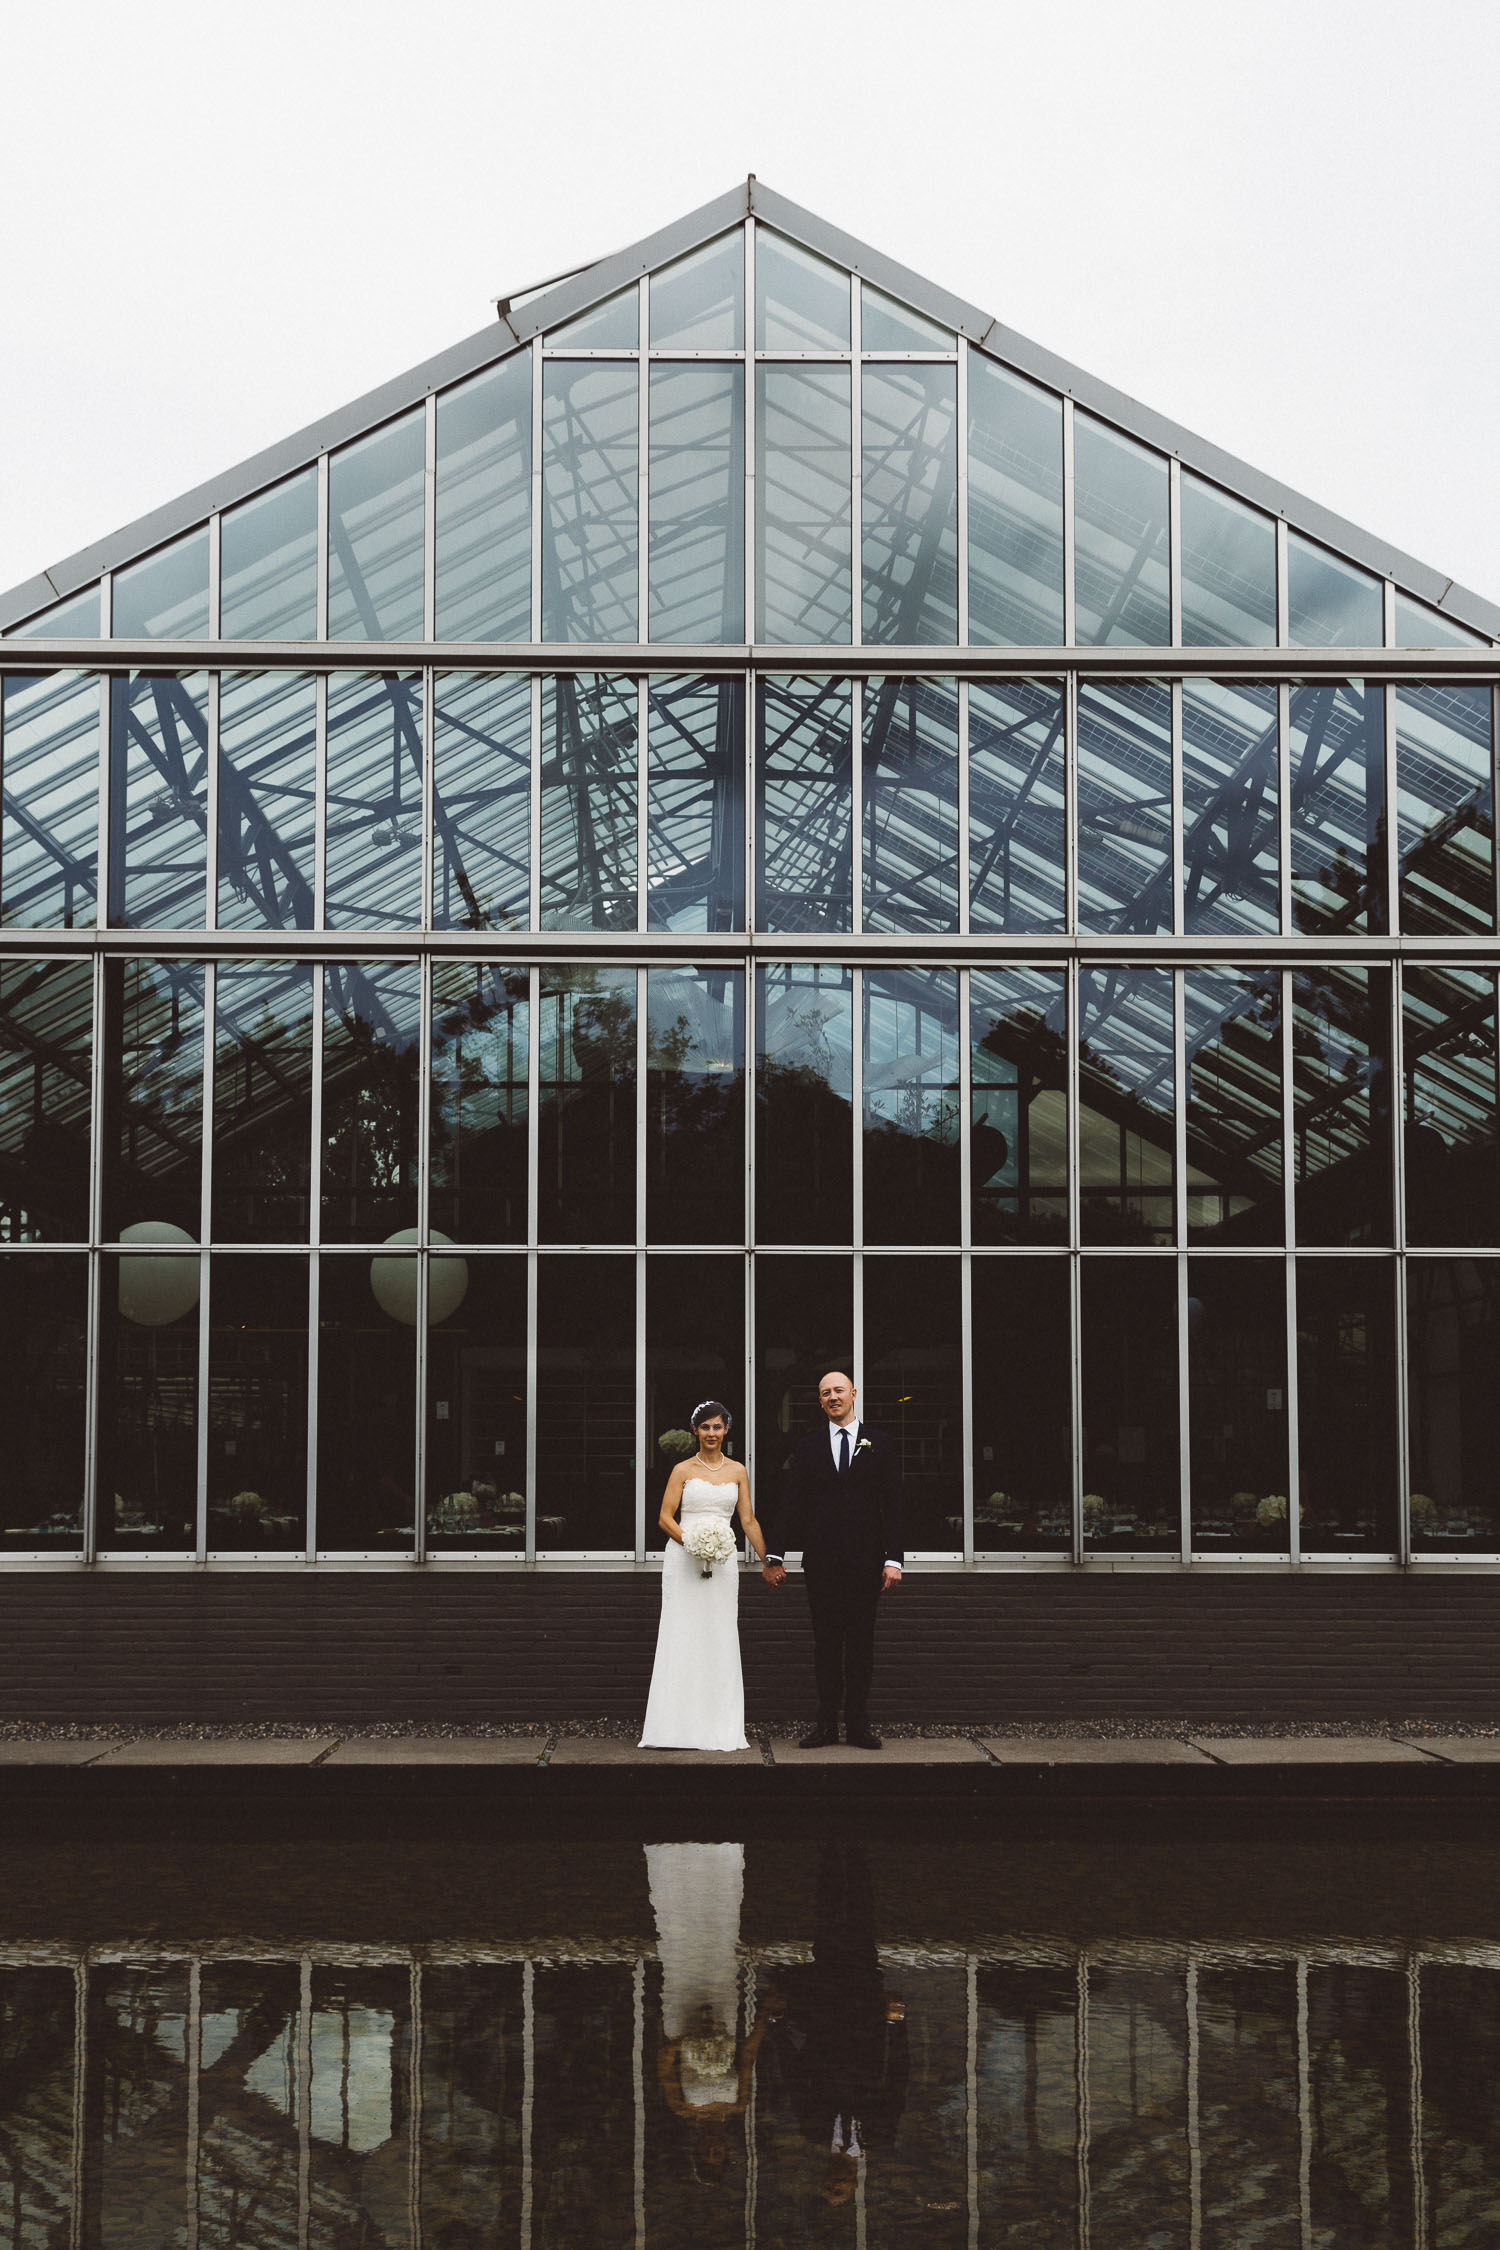 Wedding-huwelijk-trouwen-bruiloft-photography-fotografie-fotograaf-photographer-restaurant-de-Kas-On-a-hazy-morning-Amsterdam-The-Netherlands-100.jpg